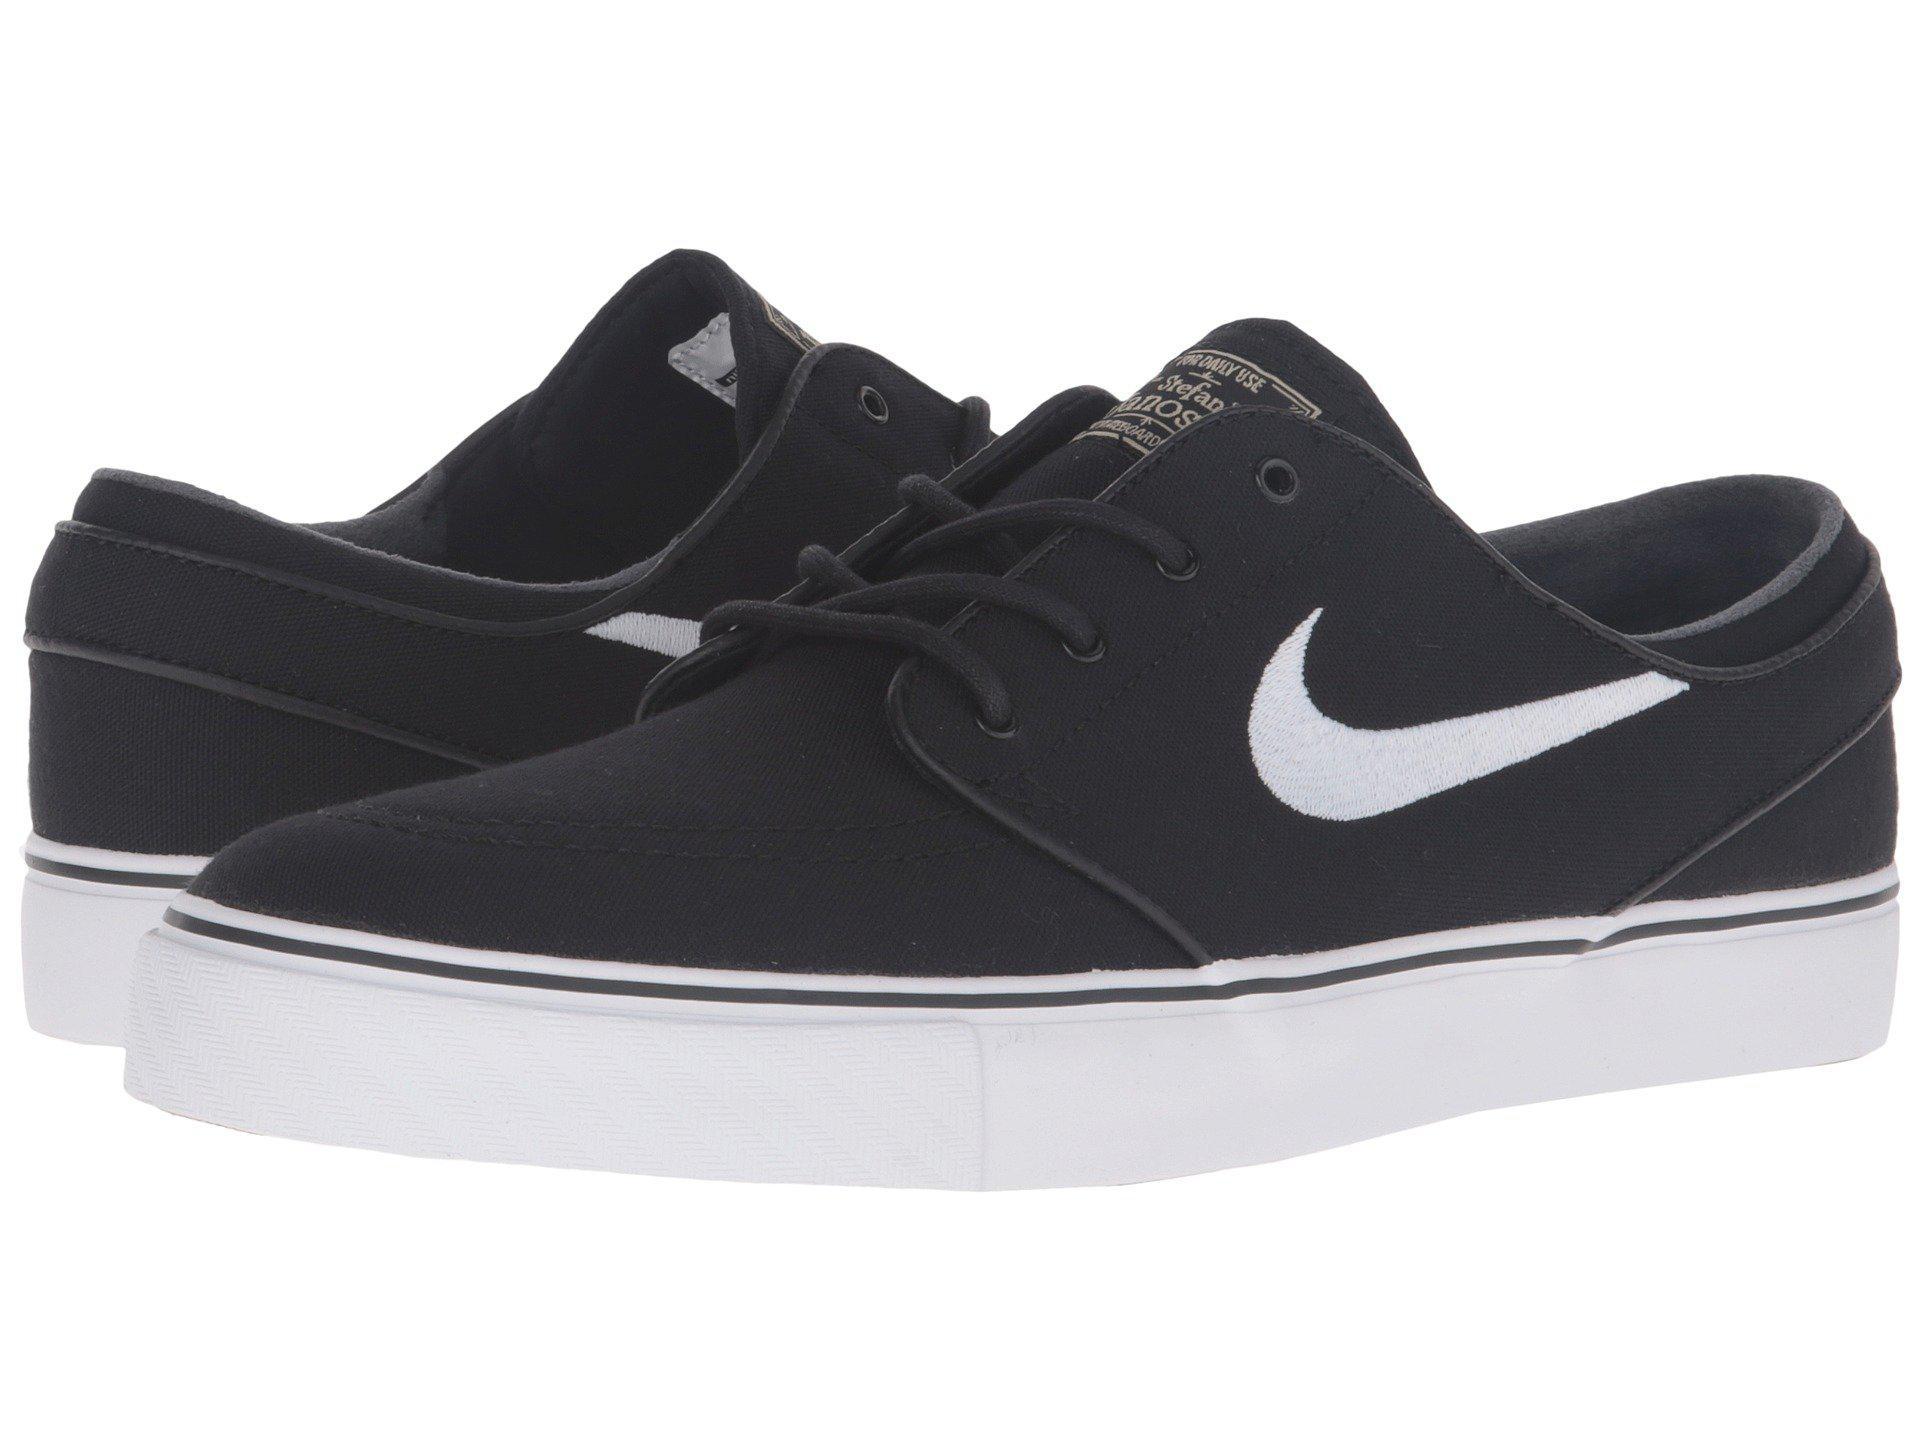 cb87f8c40275 Nike. Zoom Stefan Janoski Canvas (black gum Light Brown metallic Gold Star  white) Men s Skate Shoes